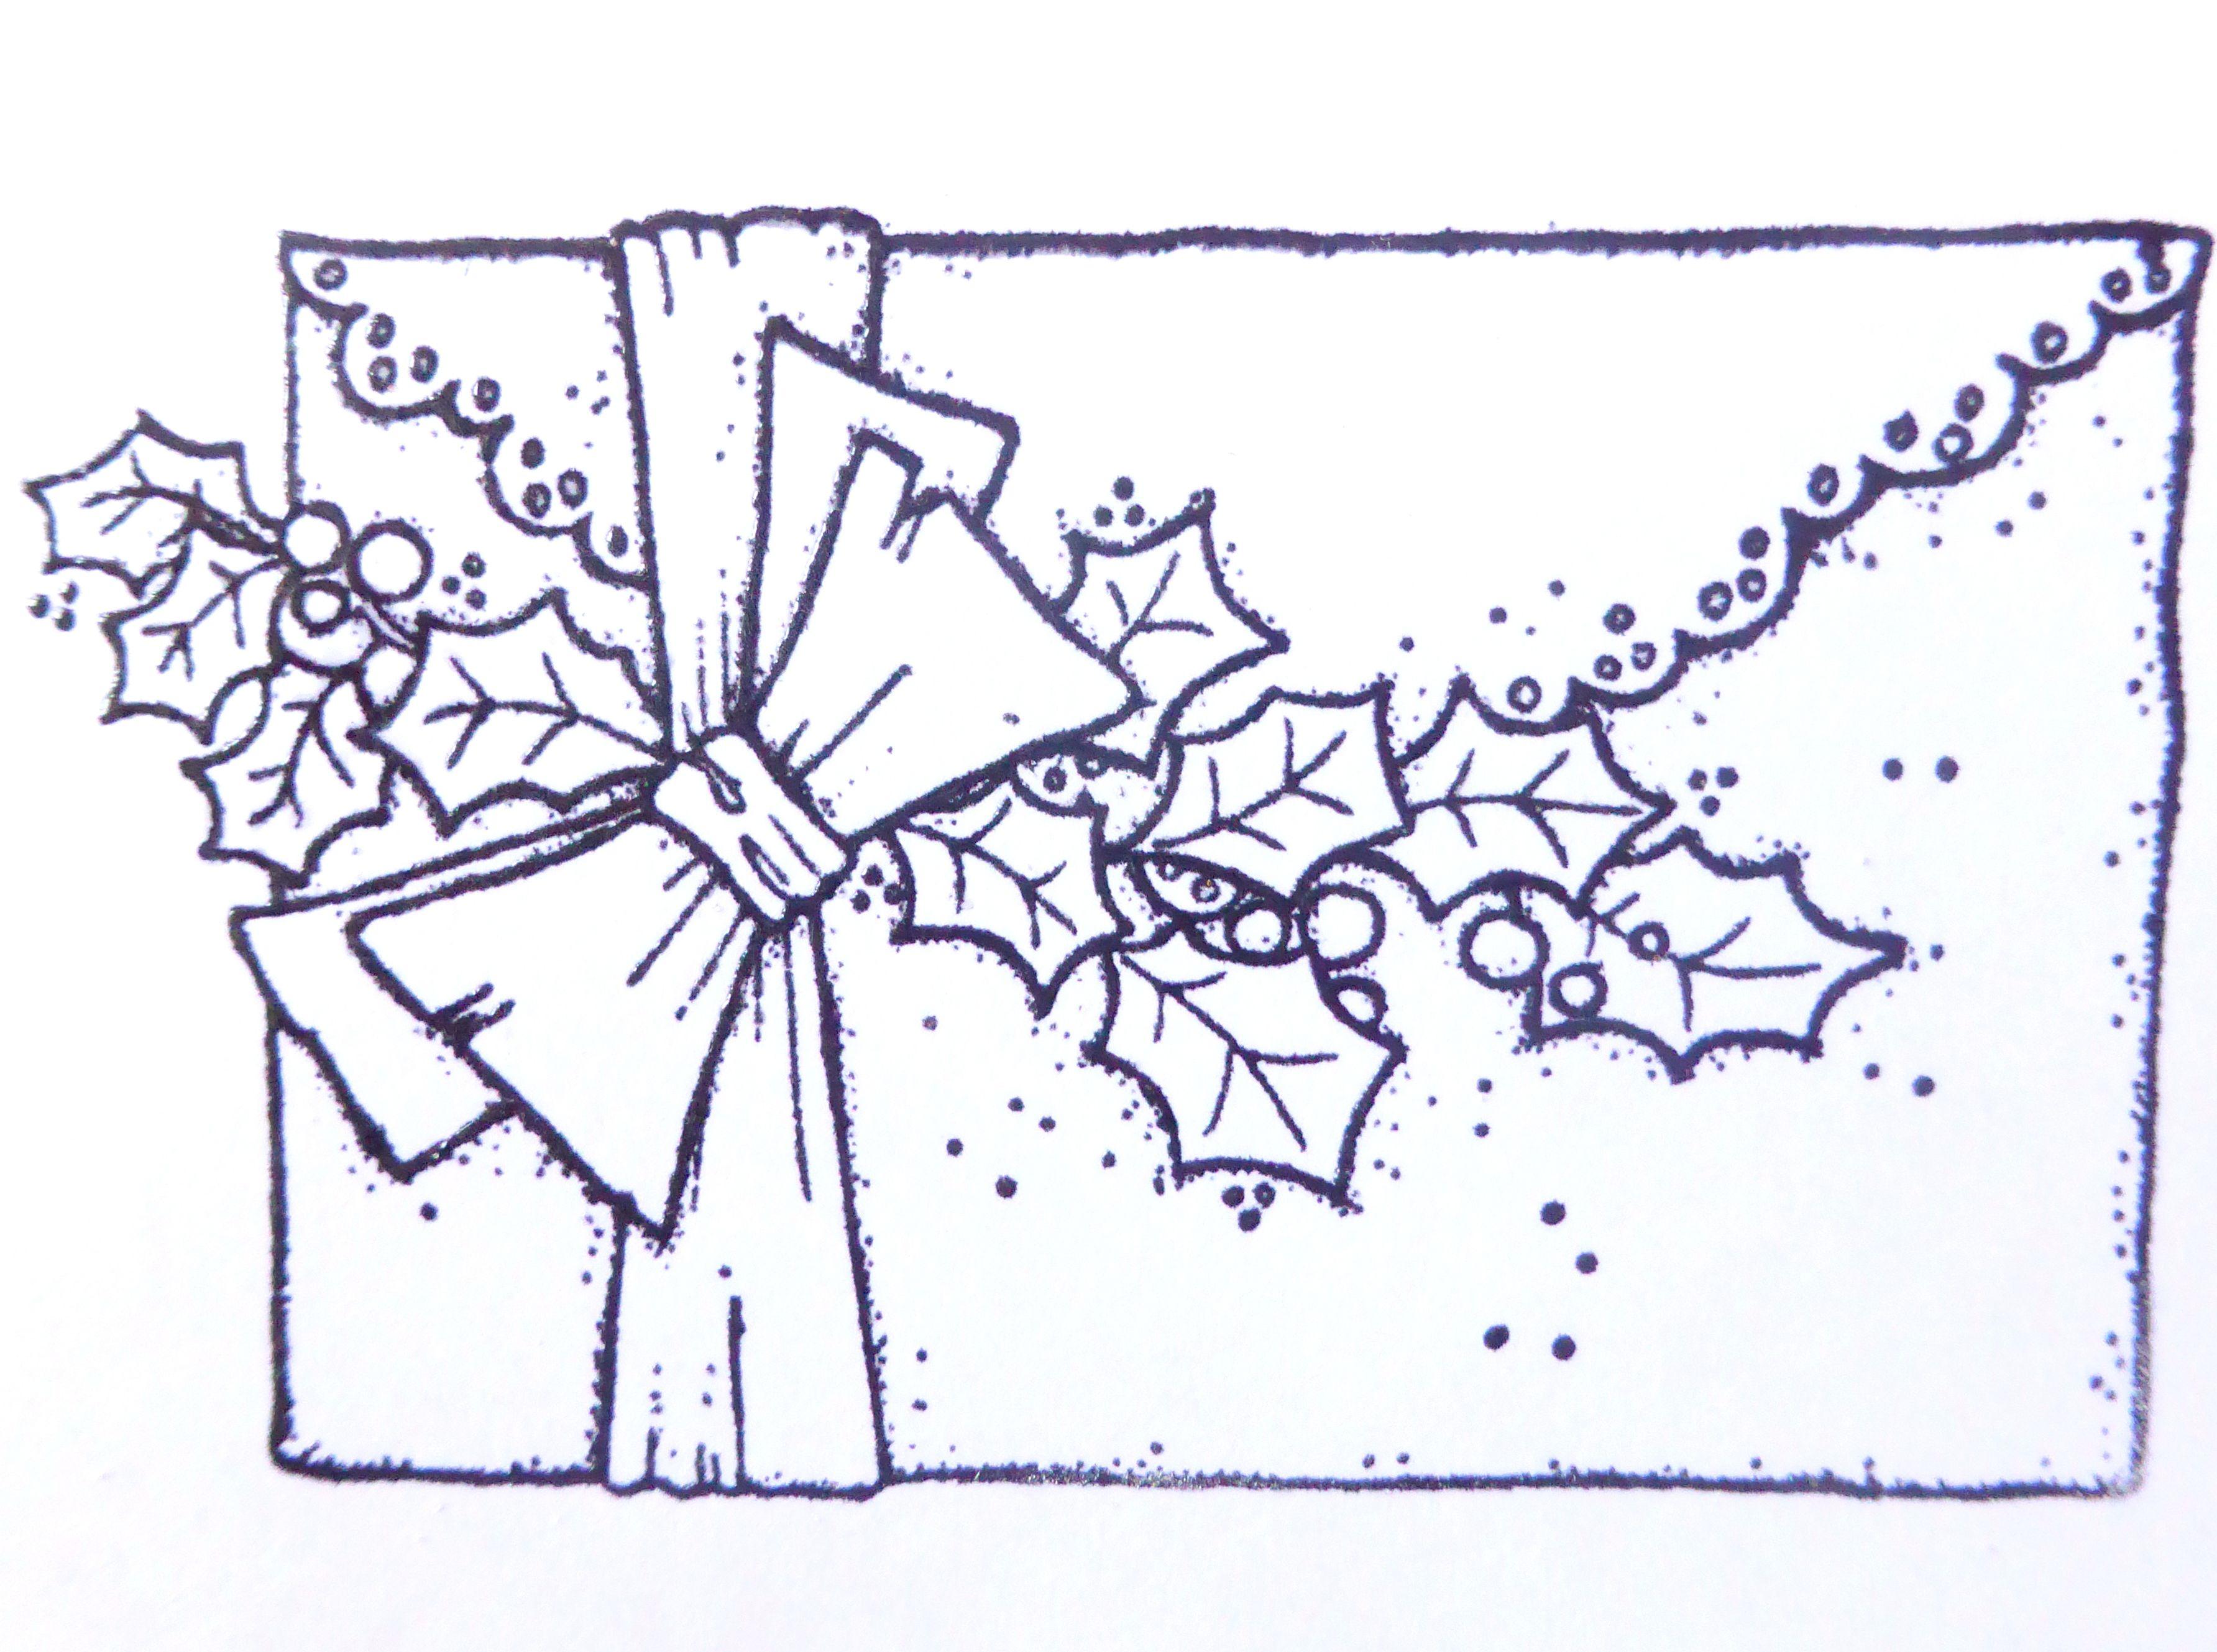 Enveloppe de noel cart es em vegetal ii pinterest magnolias tarjeteria espa ola y pergamino - Enveloppe de noel ...